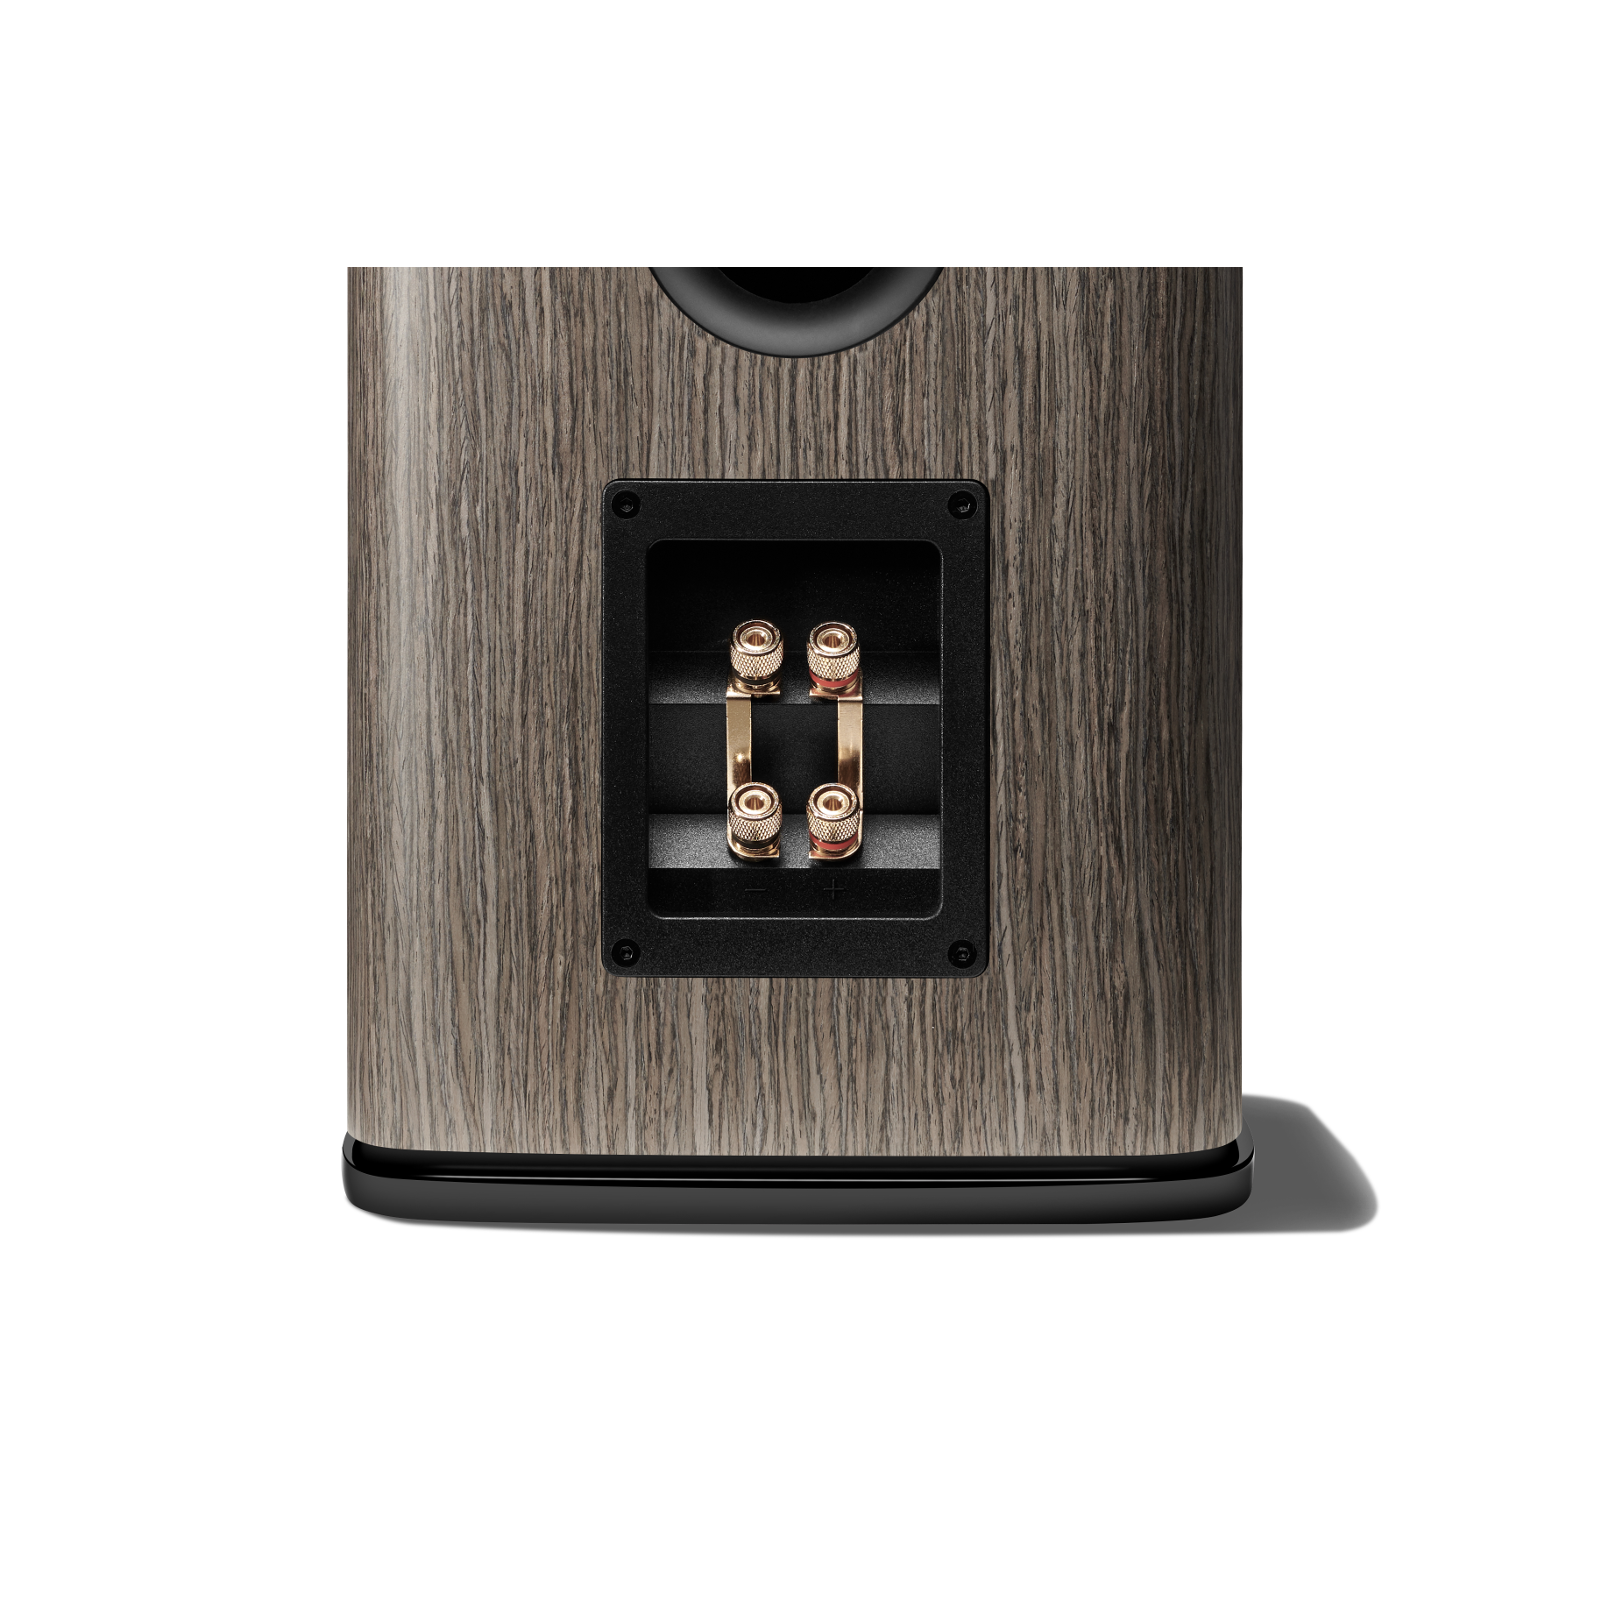 HDI-1600 - Grey Oak - 2-way 6.5-inch (165mm) Bookshelf Loudspeaker - Detailshot 2